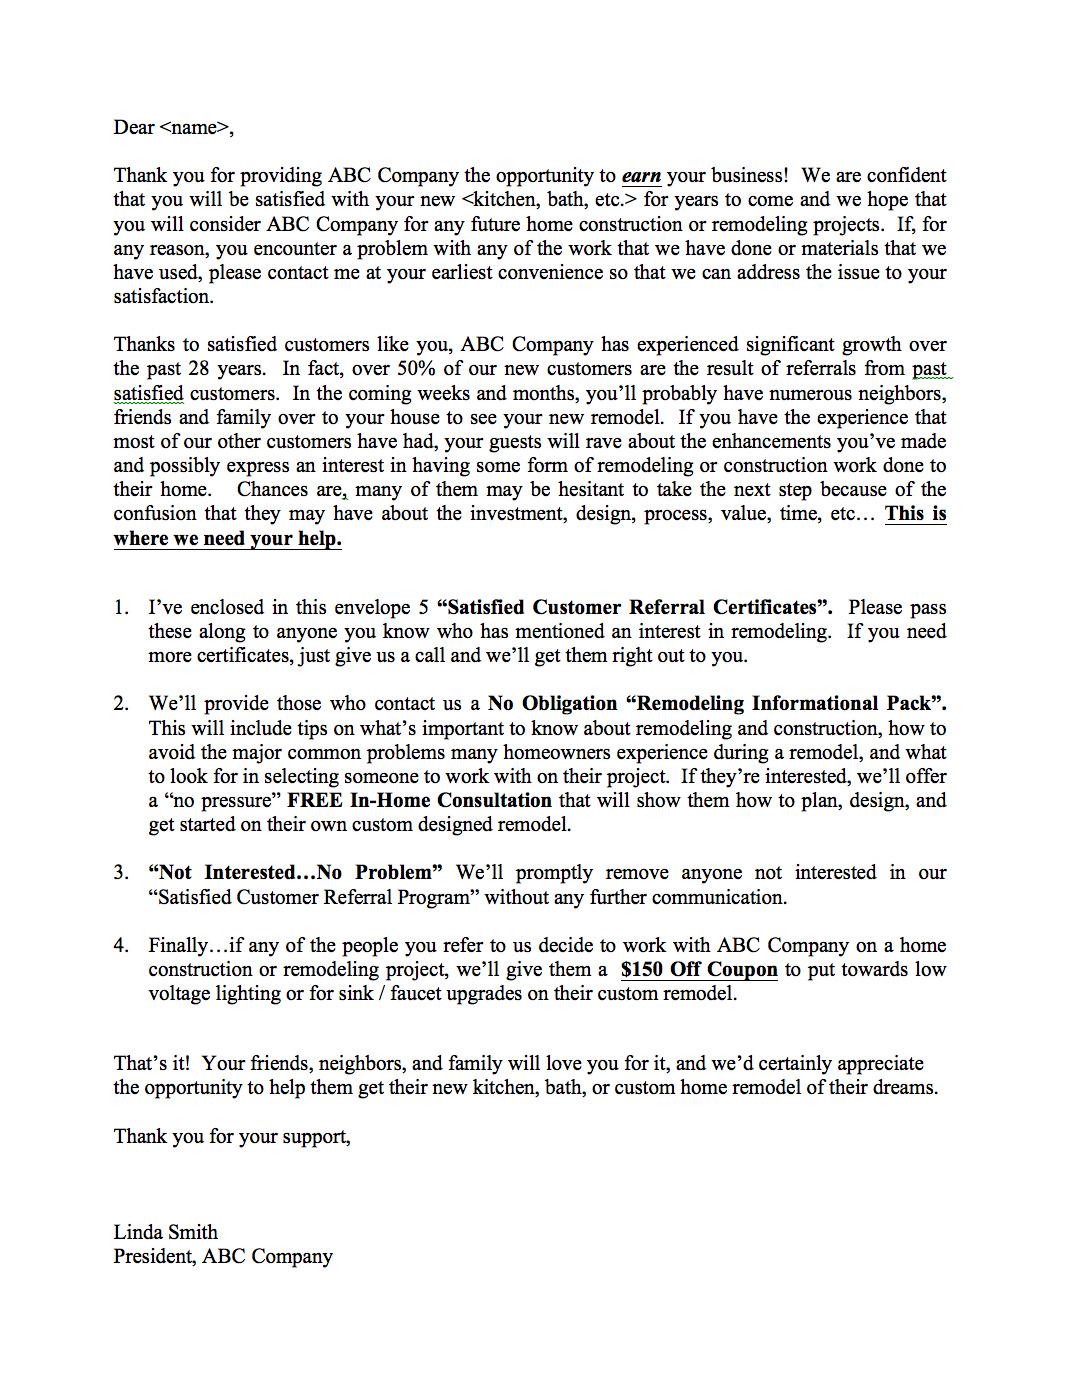 Job Application Letter Mentioning Reference | Resume Pdf ...